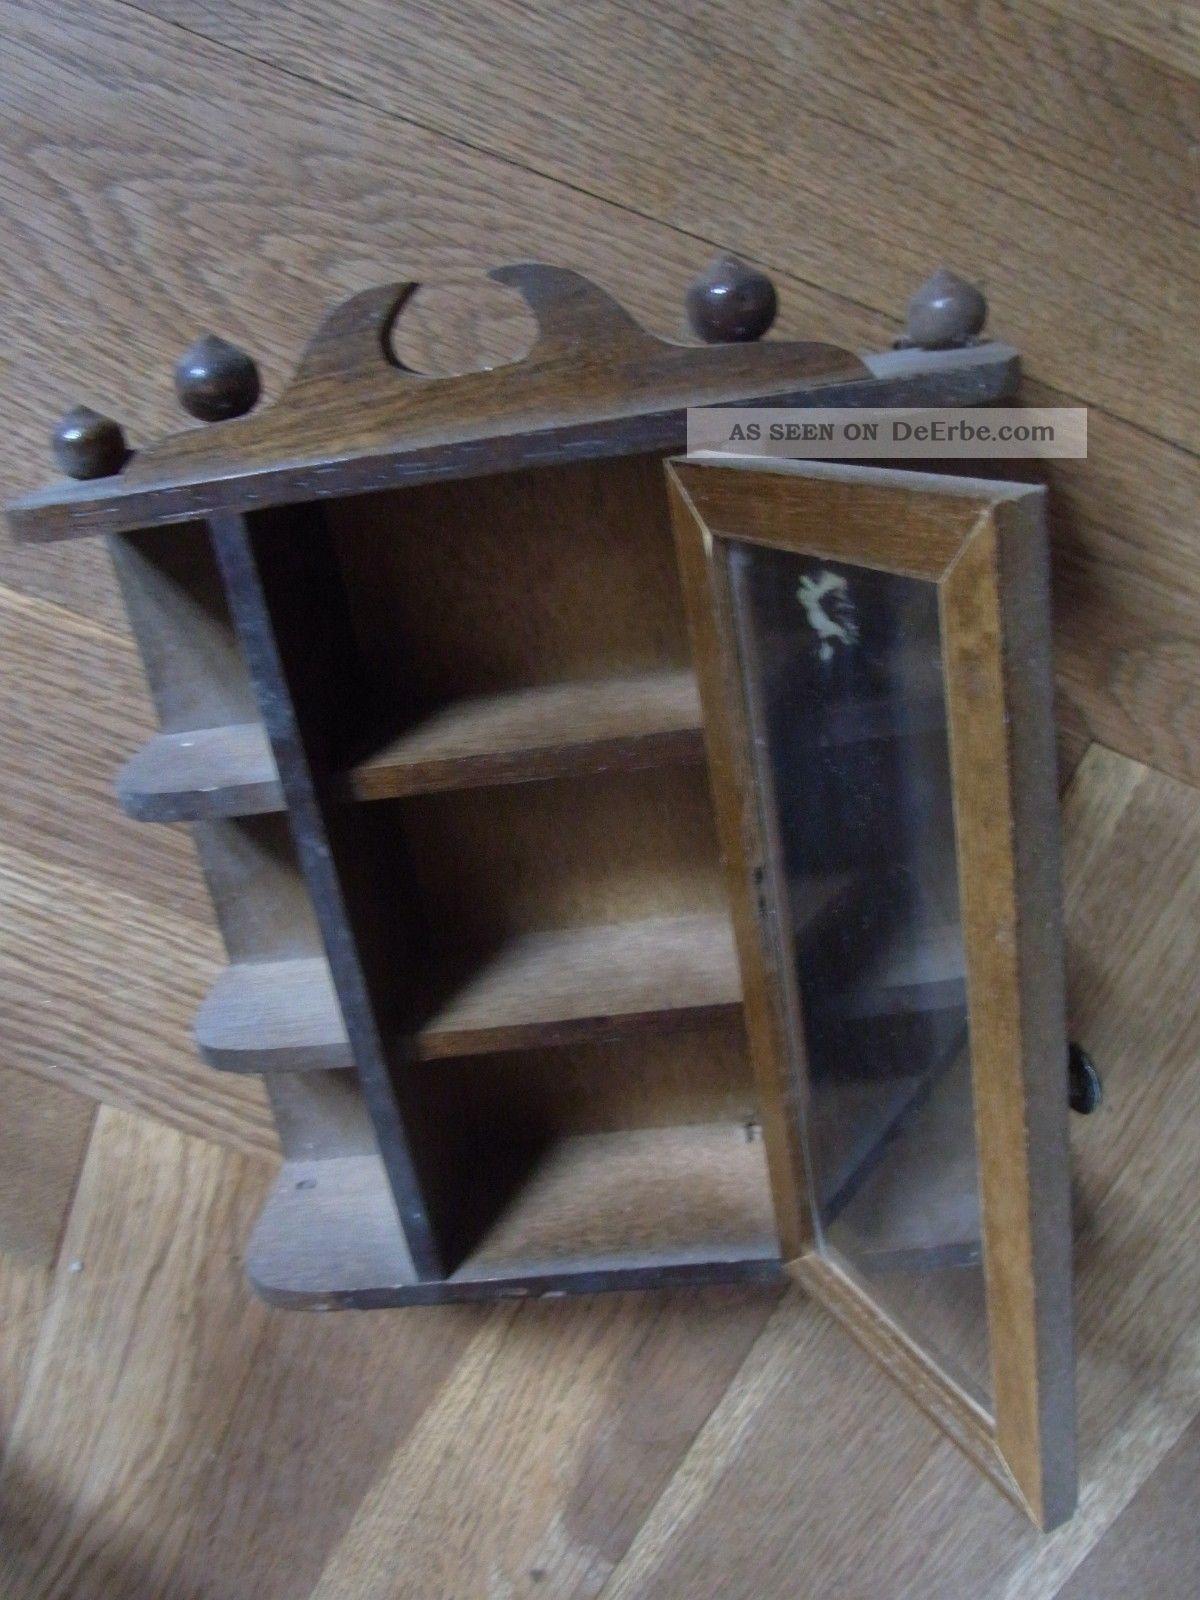 alter puppenstuben schrank puppen schr nkchen aus echtholz puppenm bel m bel rar. Black Bedroom Furniture Sets. Home Design Ideas